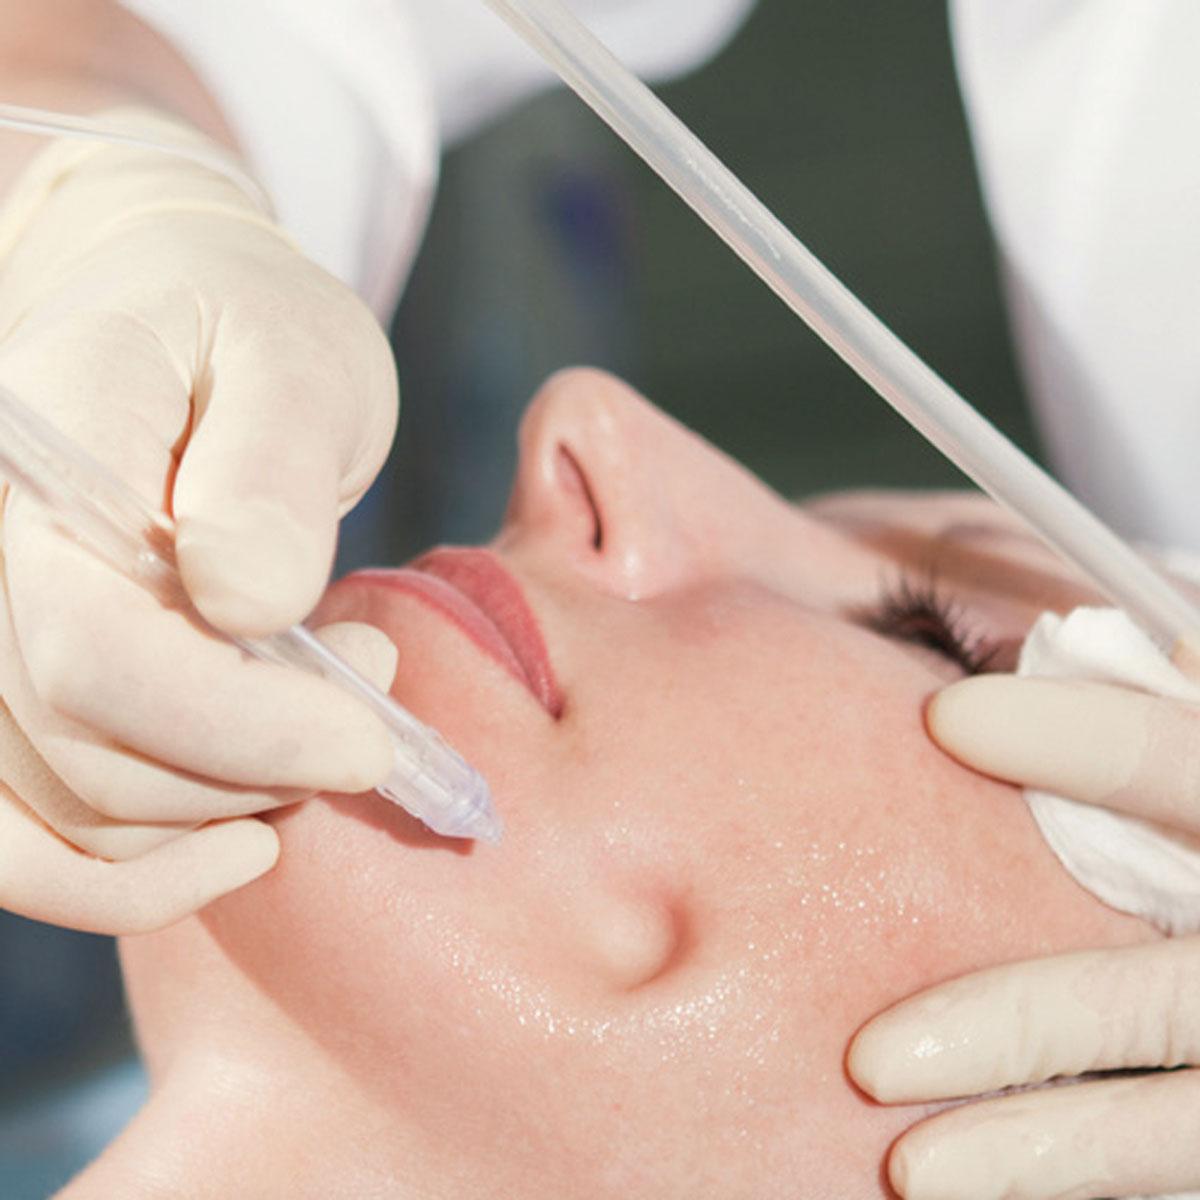 JetPeel Behandlung Gesicht bei Dr. Wallentin Wien